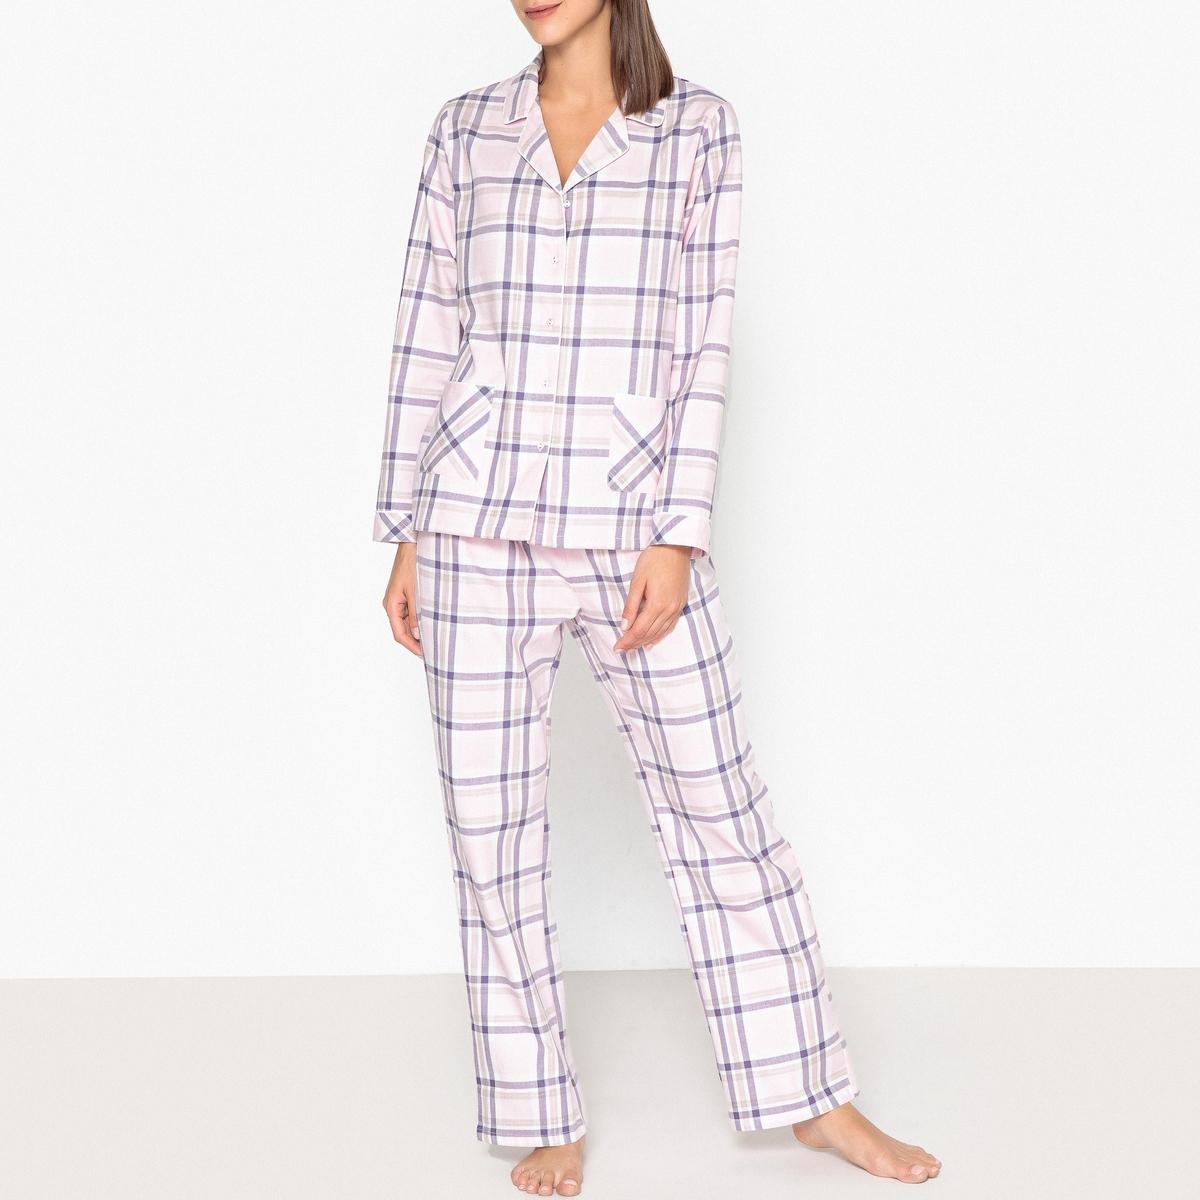 Pijama camisero